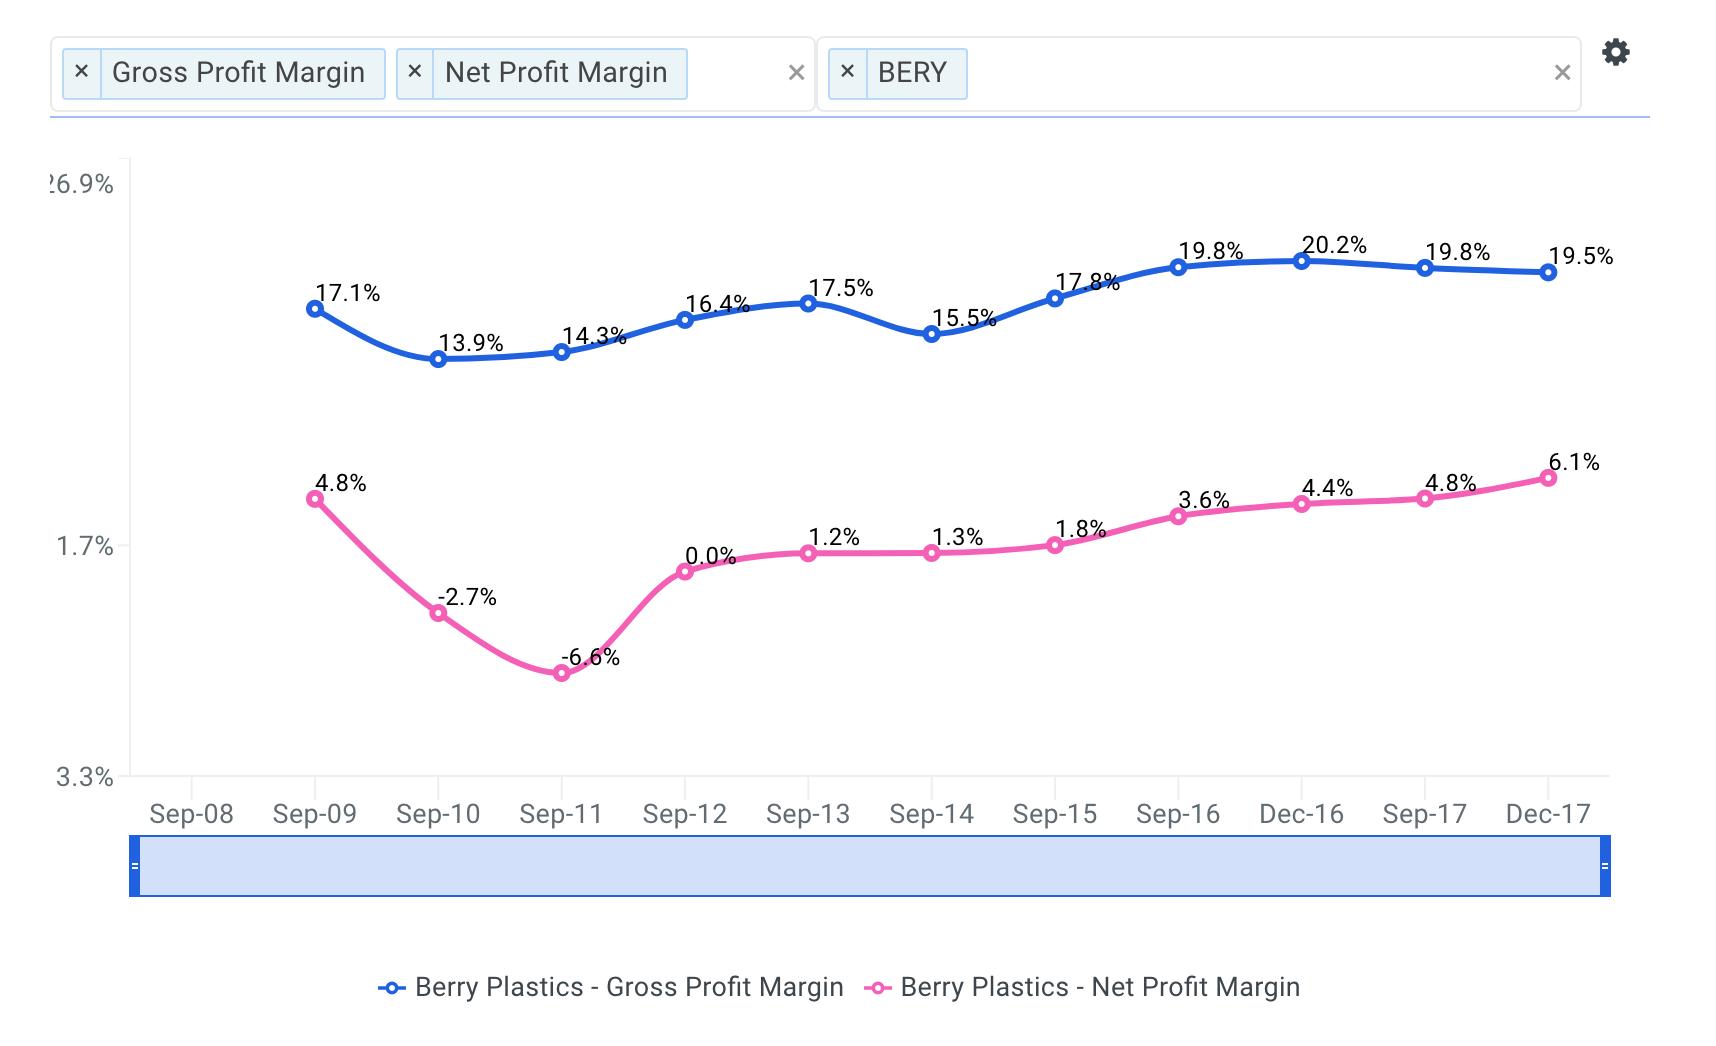 BERY Net Profit Margin Chart